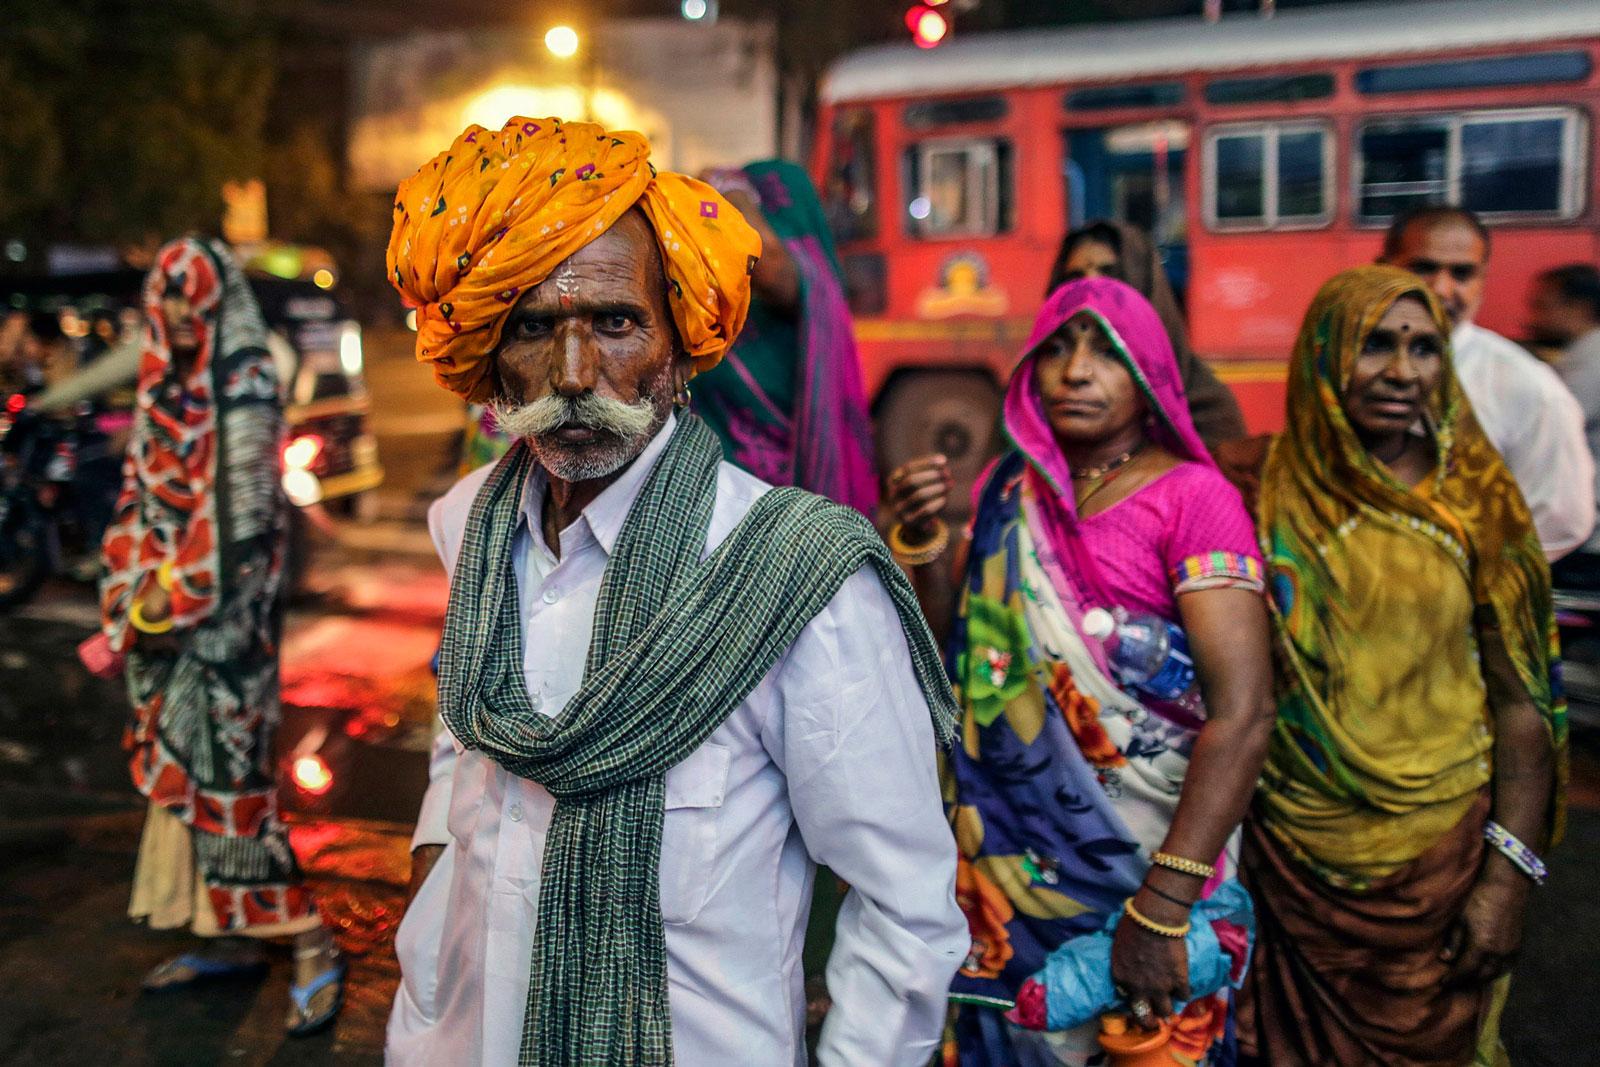 A Hindu pilgrim poses for a photograph near a bus stop in Nashik, Maharashtra, India